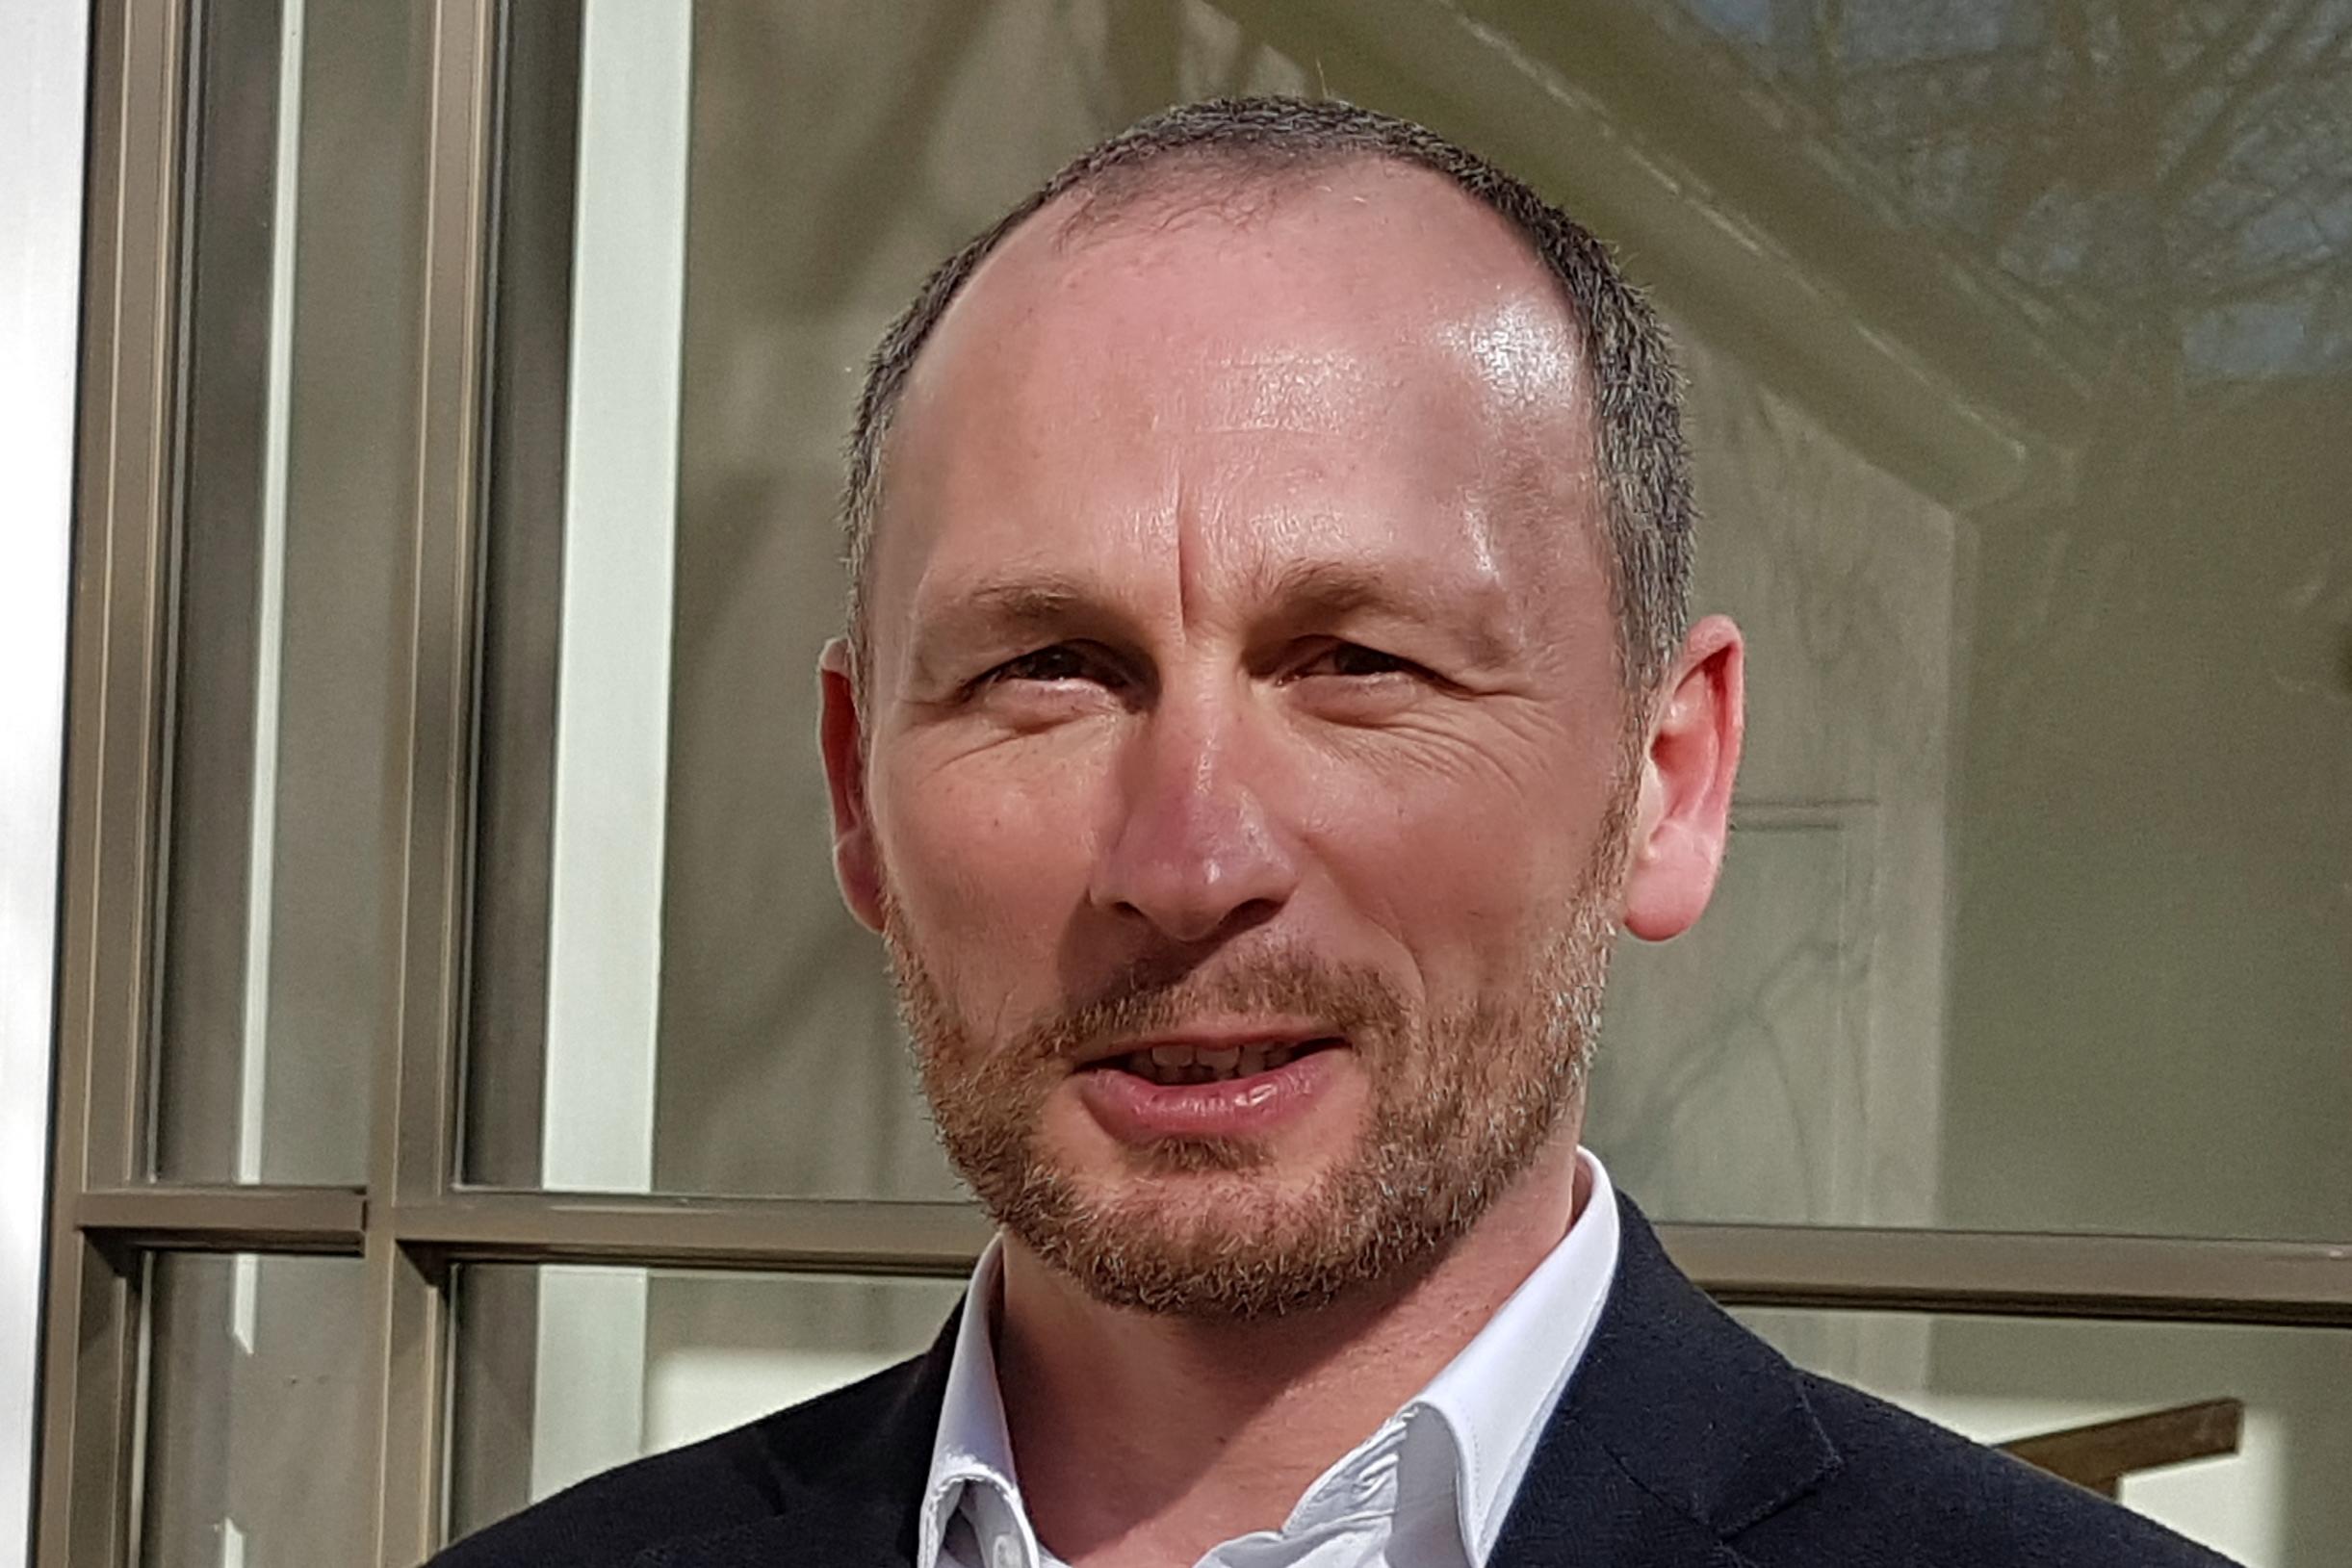 Michael Wlochal